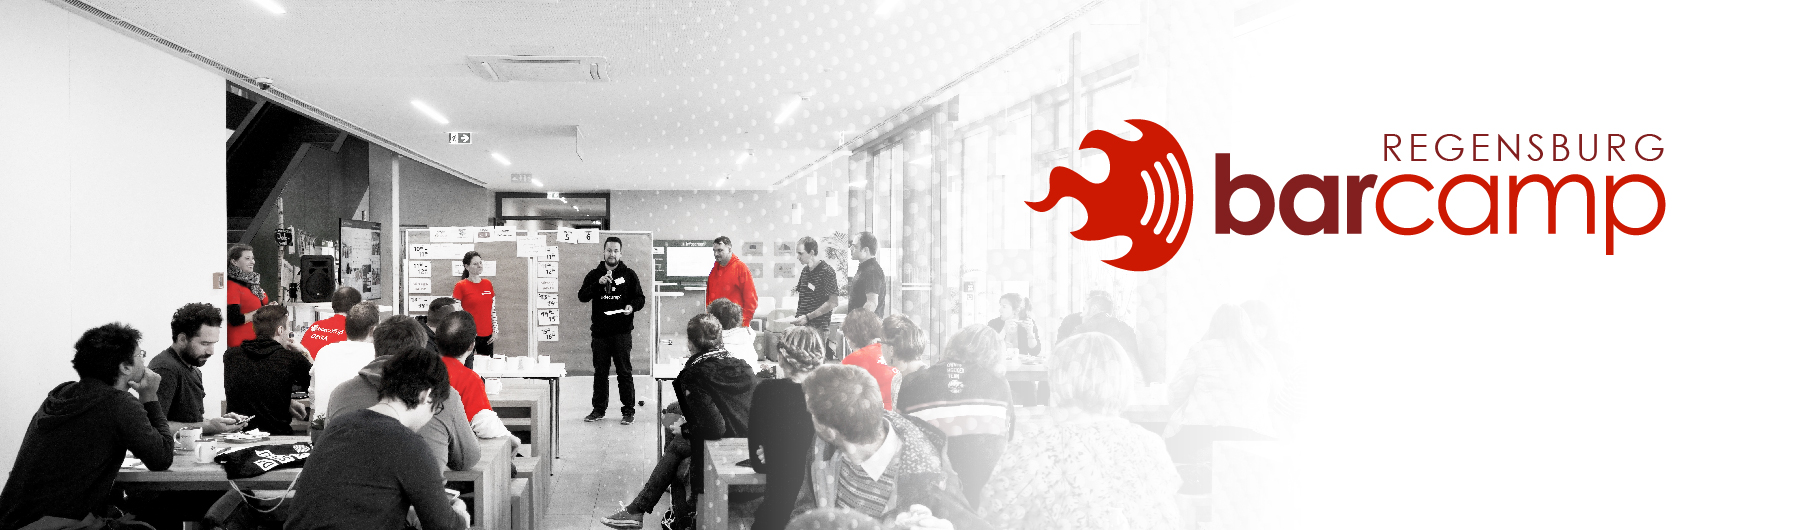 BarCamp Regensburg 2018